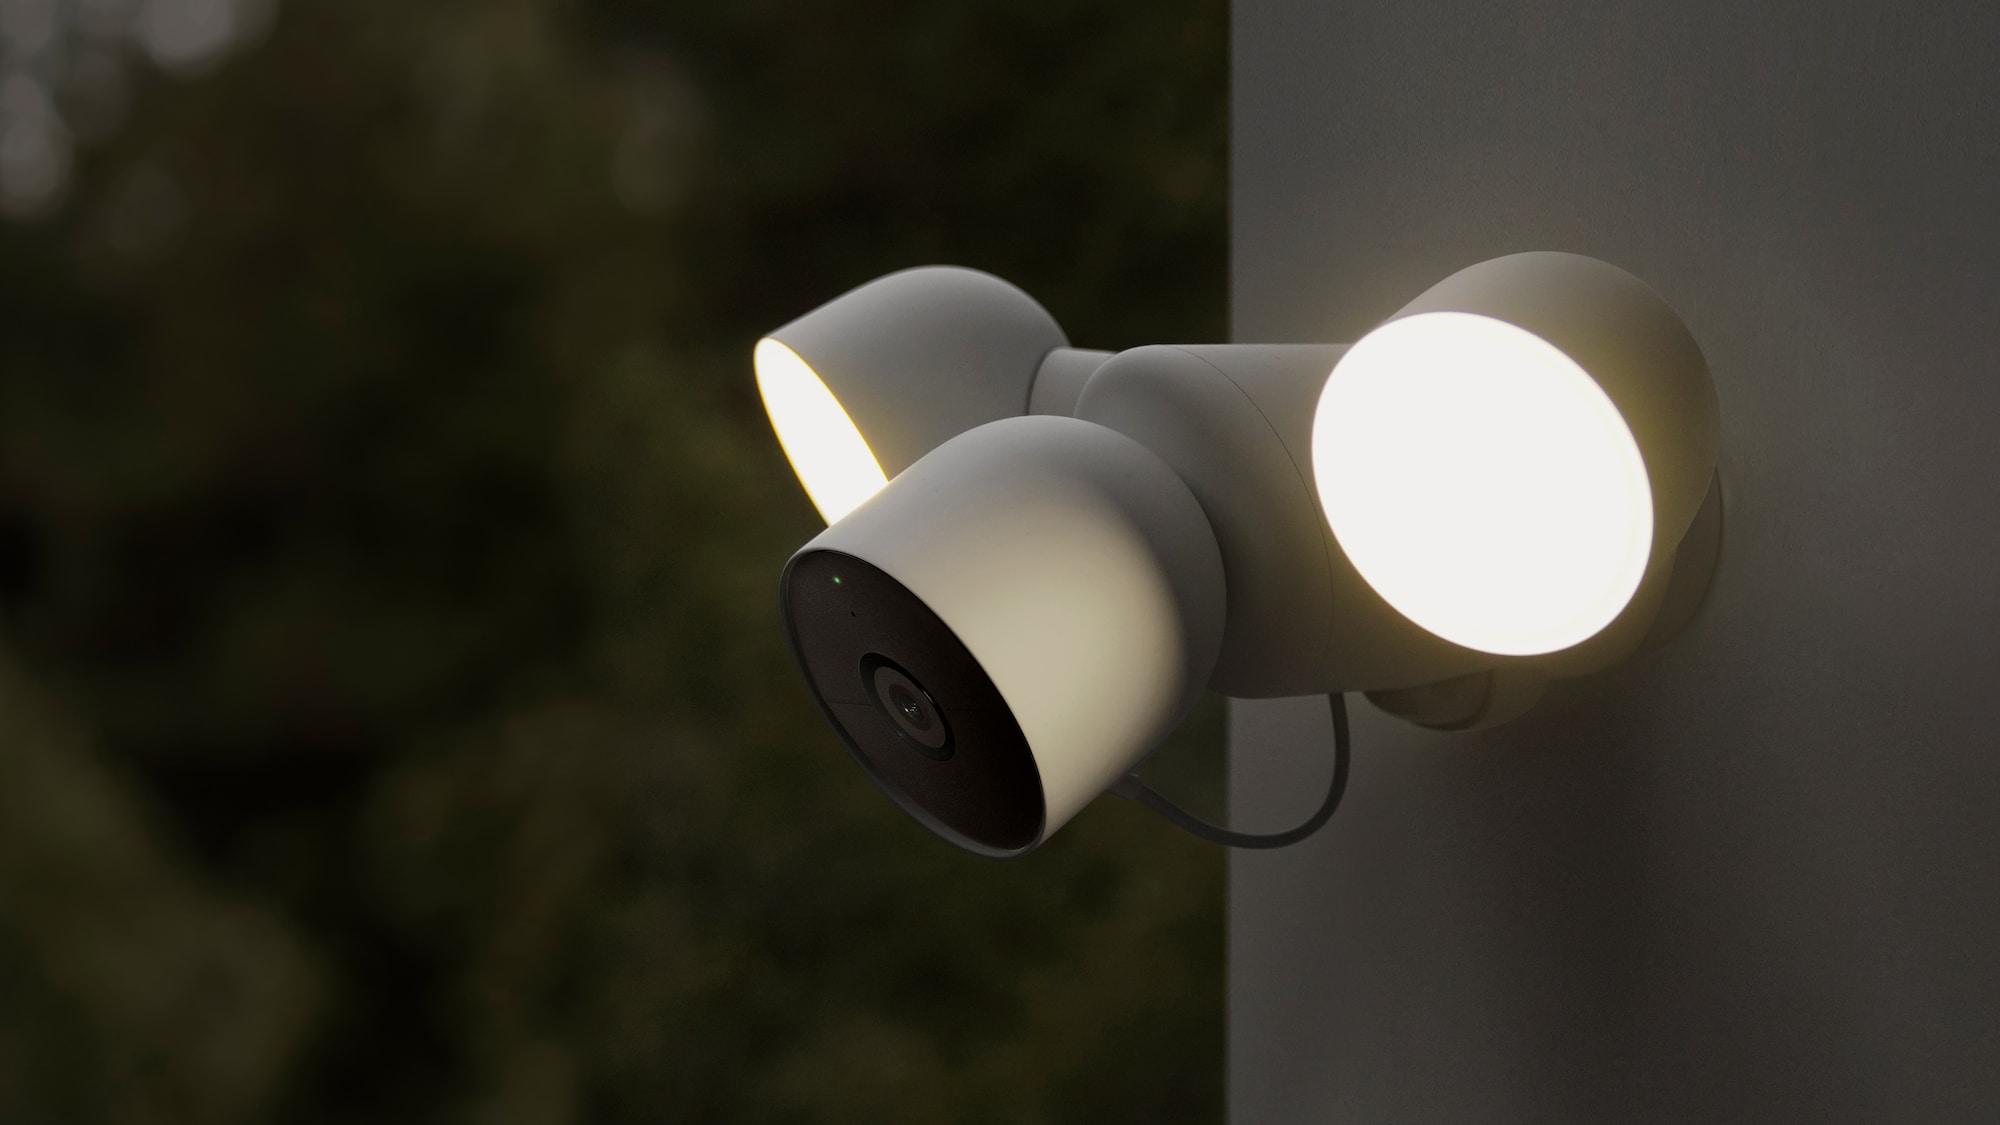 Google Nest Cam with floodlight